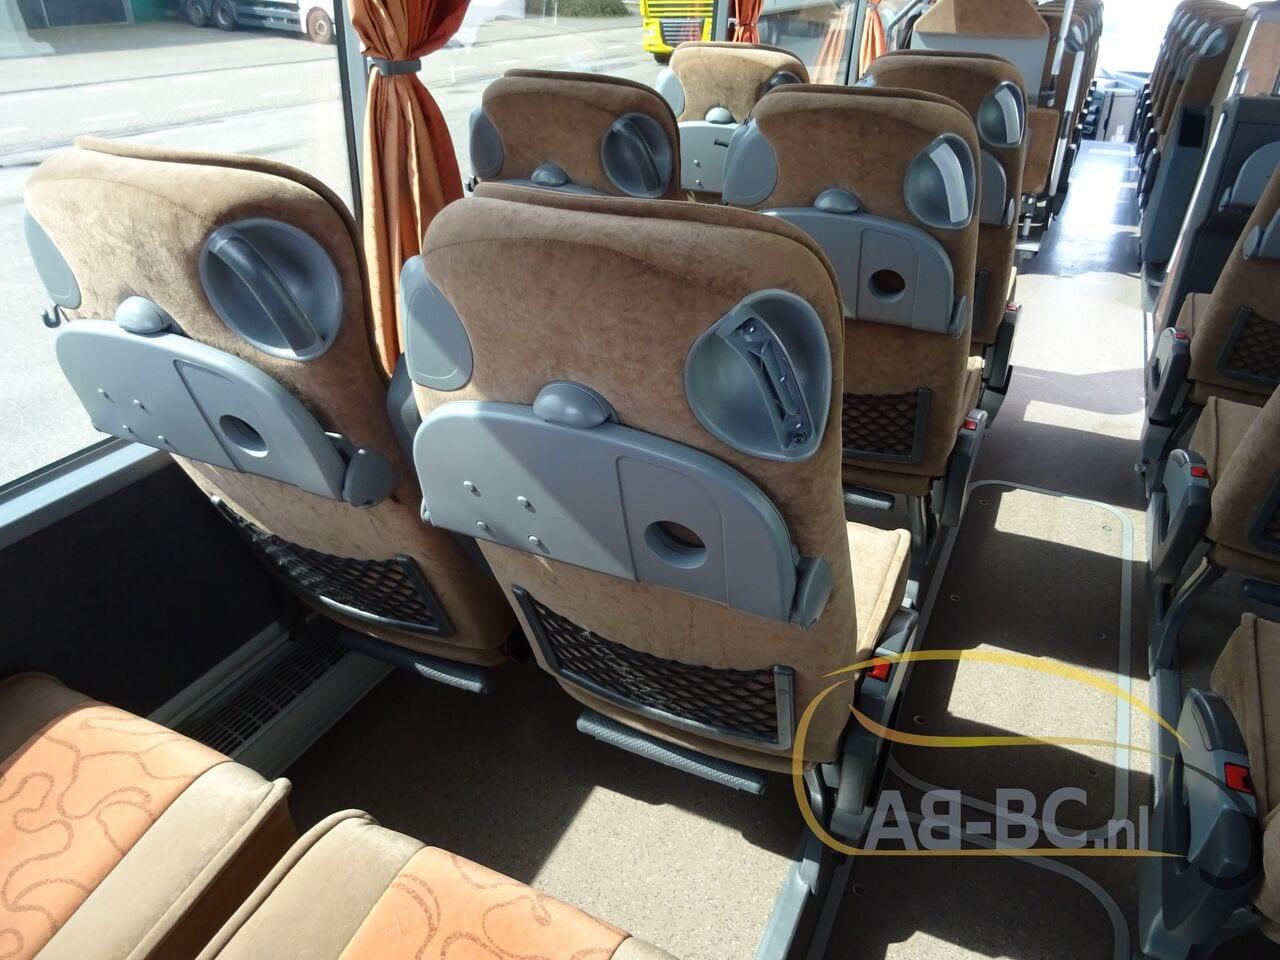 coach-busSETRA-S416H-48-SEATS-LIFTBUS---1620309954632174212_big_d66e8d88e4f67e00ae8ad89a8b57df1a--21050616581387095000